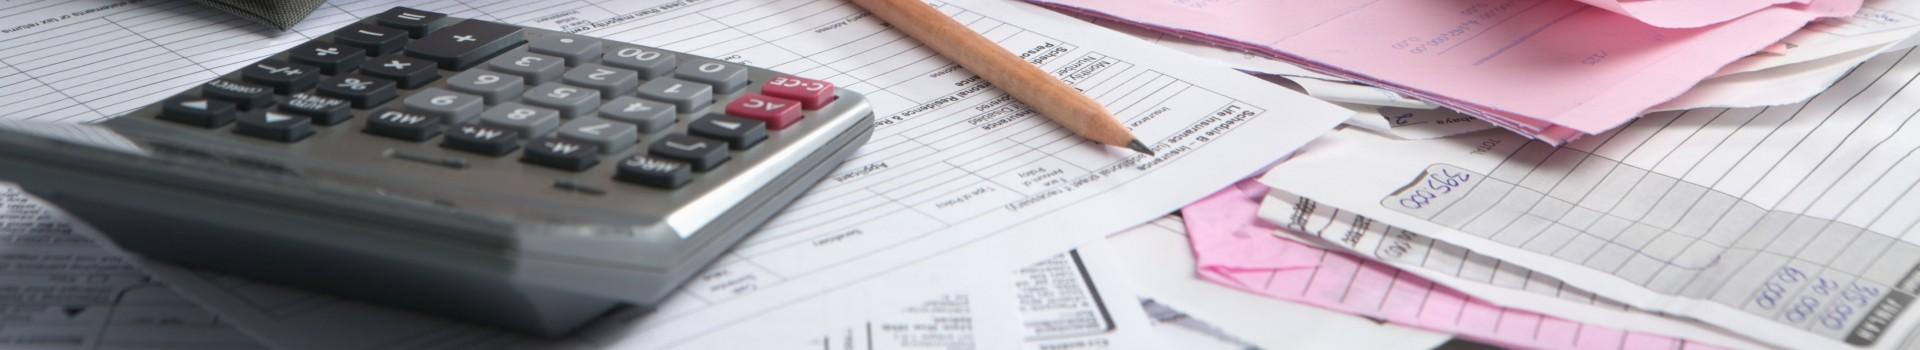 Calculator and paperwork